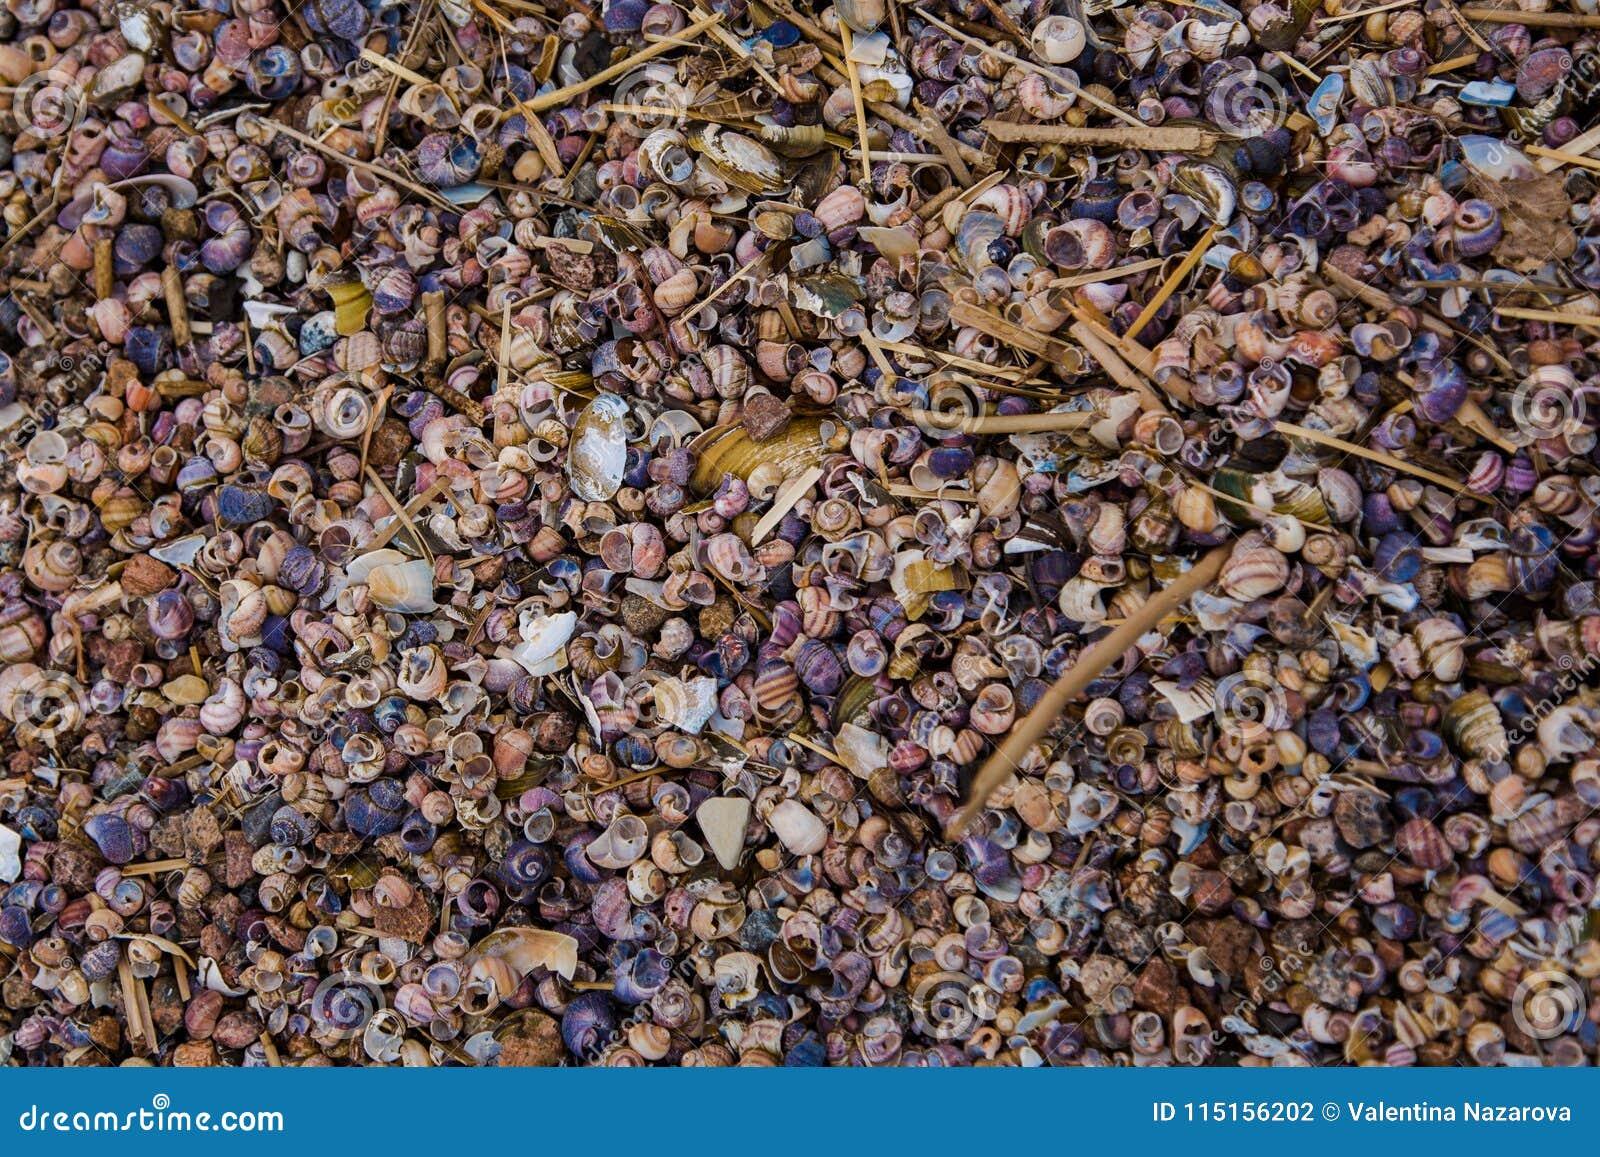 Heel wat kleine shells